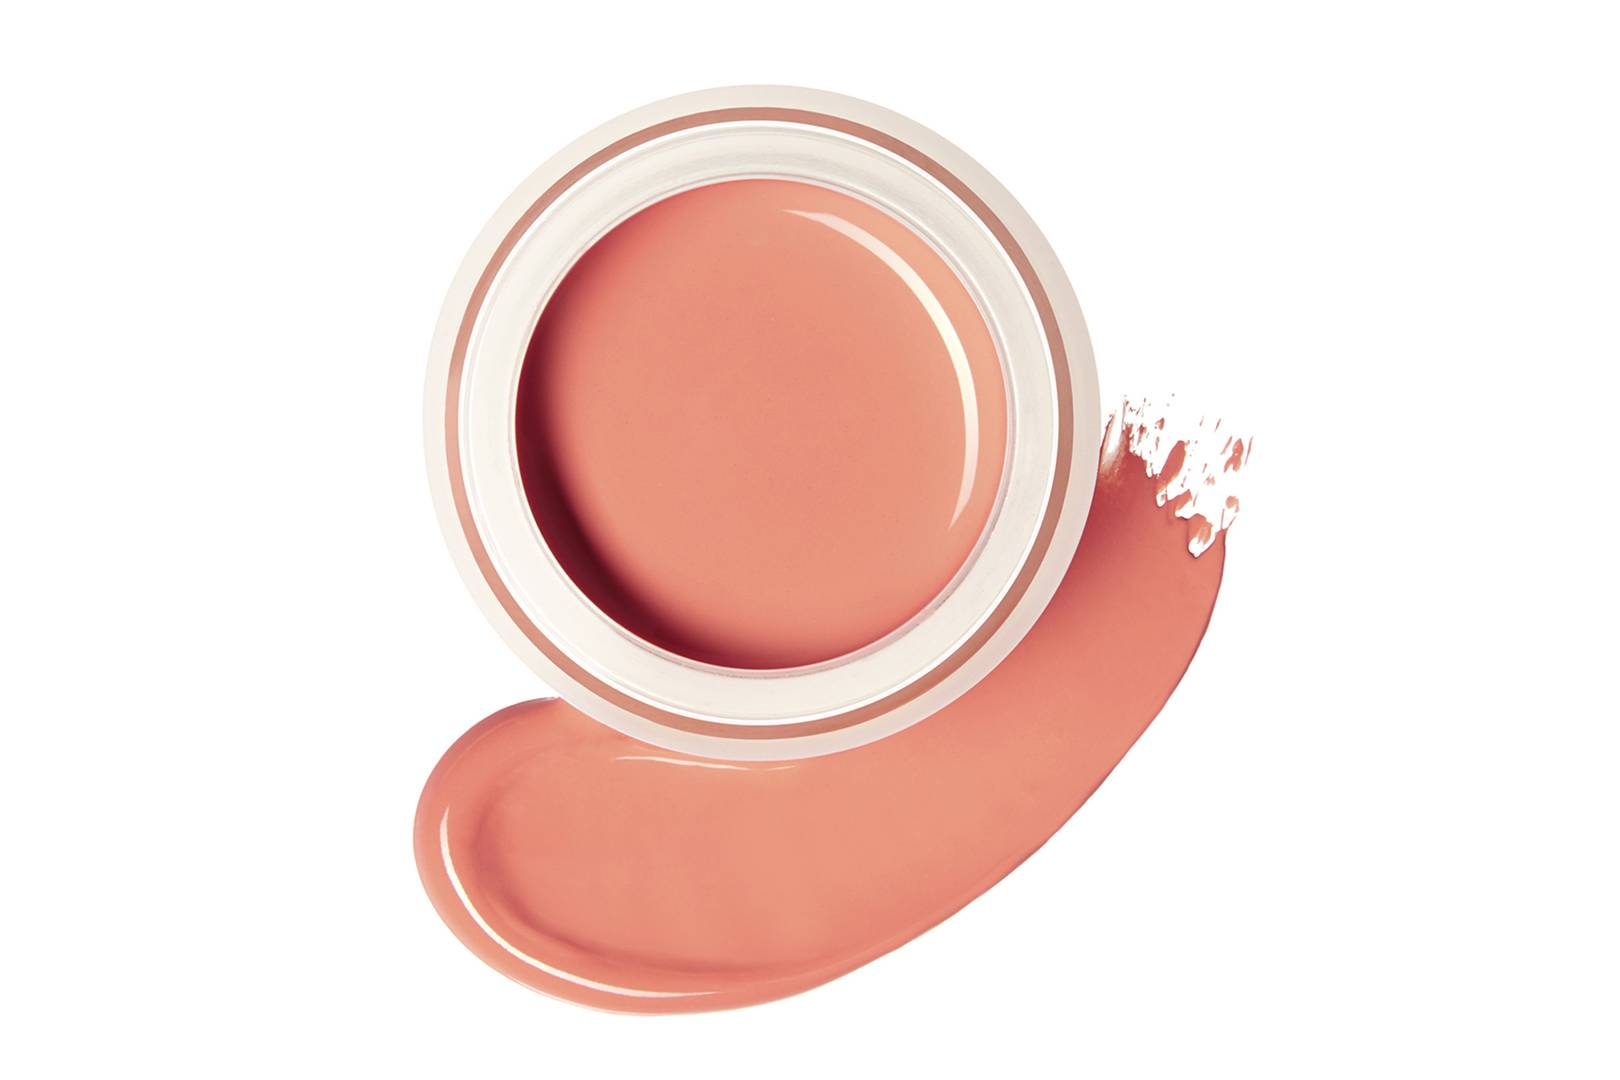 51a606176455d6 Best Blush 2019: Blusher Powder, Creams & Gels | Glamour UK